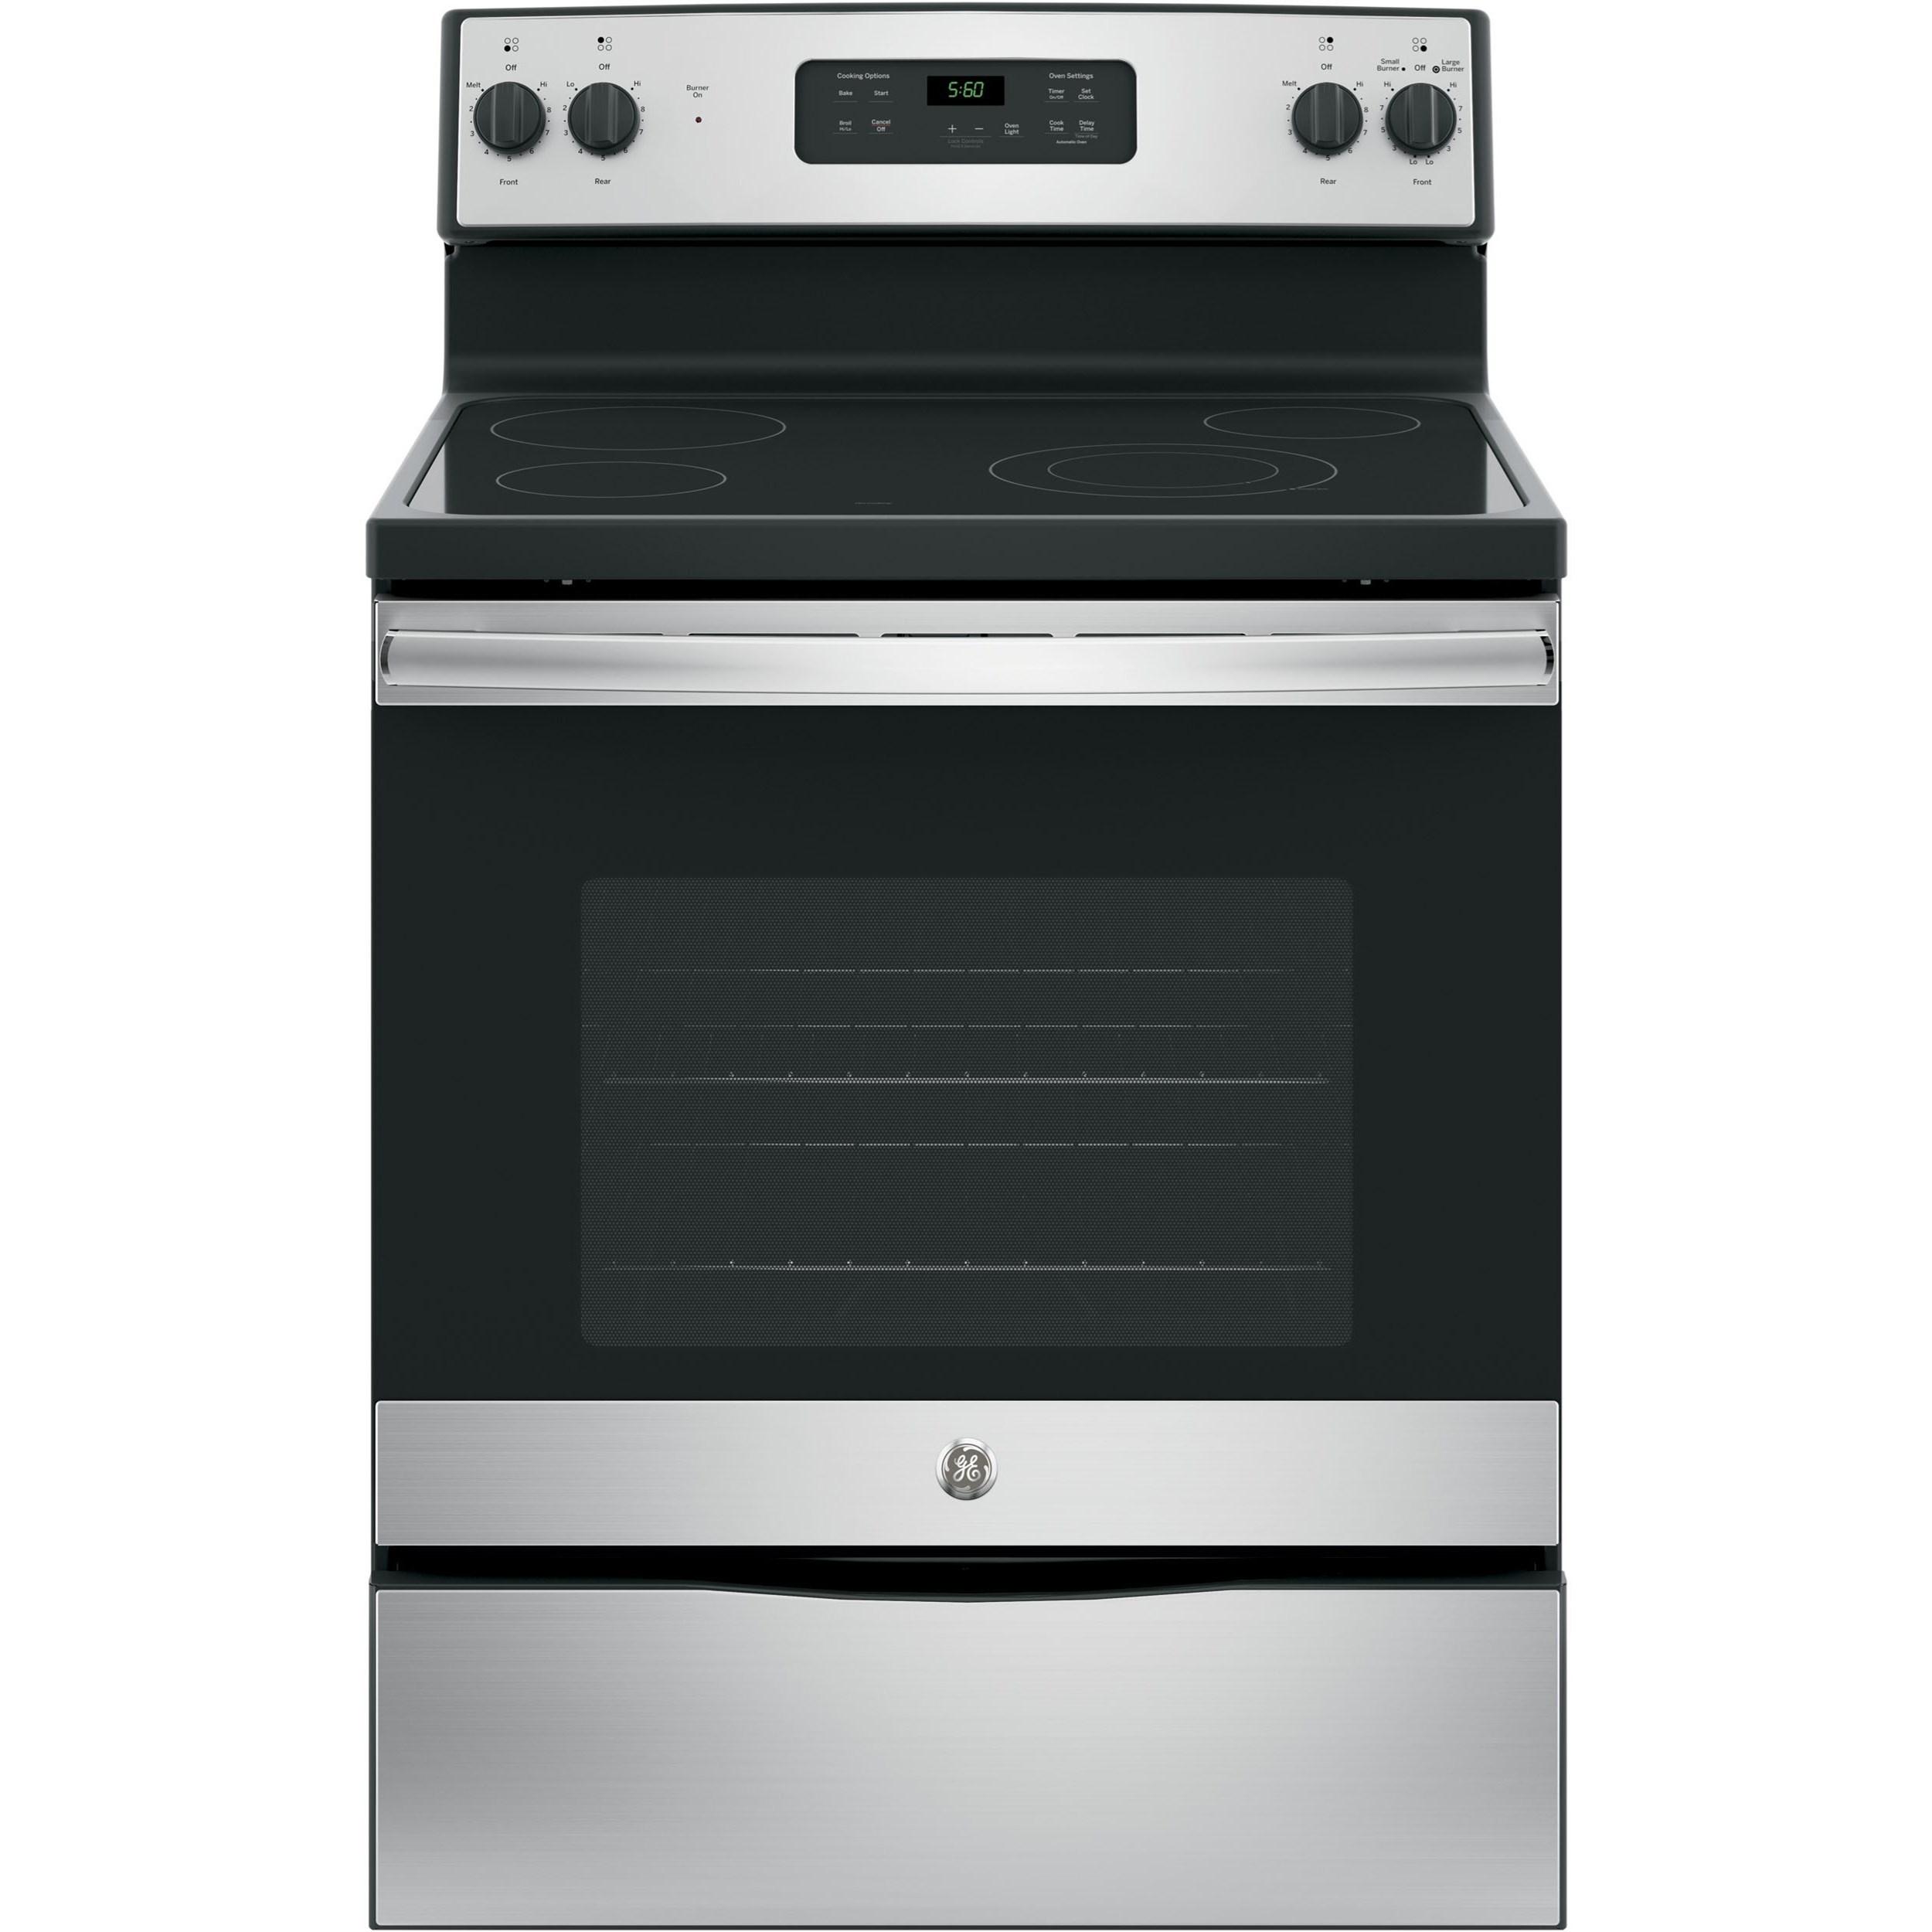 "GE Appliances GE Electric Ranges GE® 30"" Free-Standing Electric Range - Item Number: JBS60RKSS"